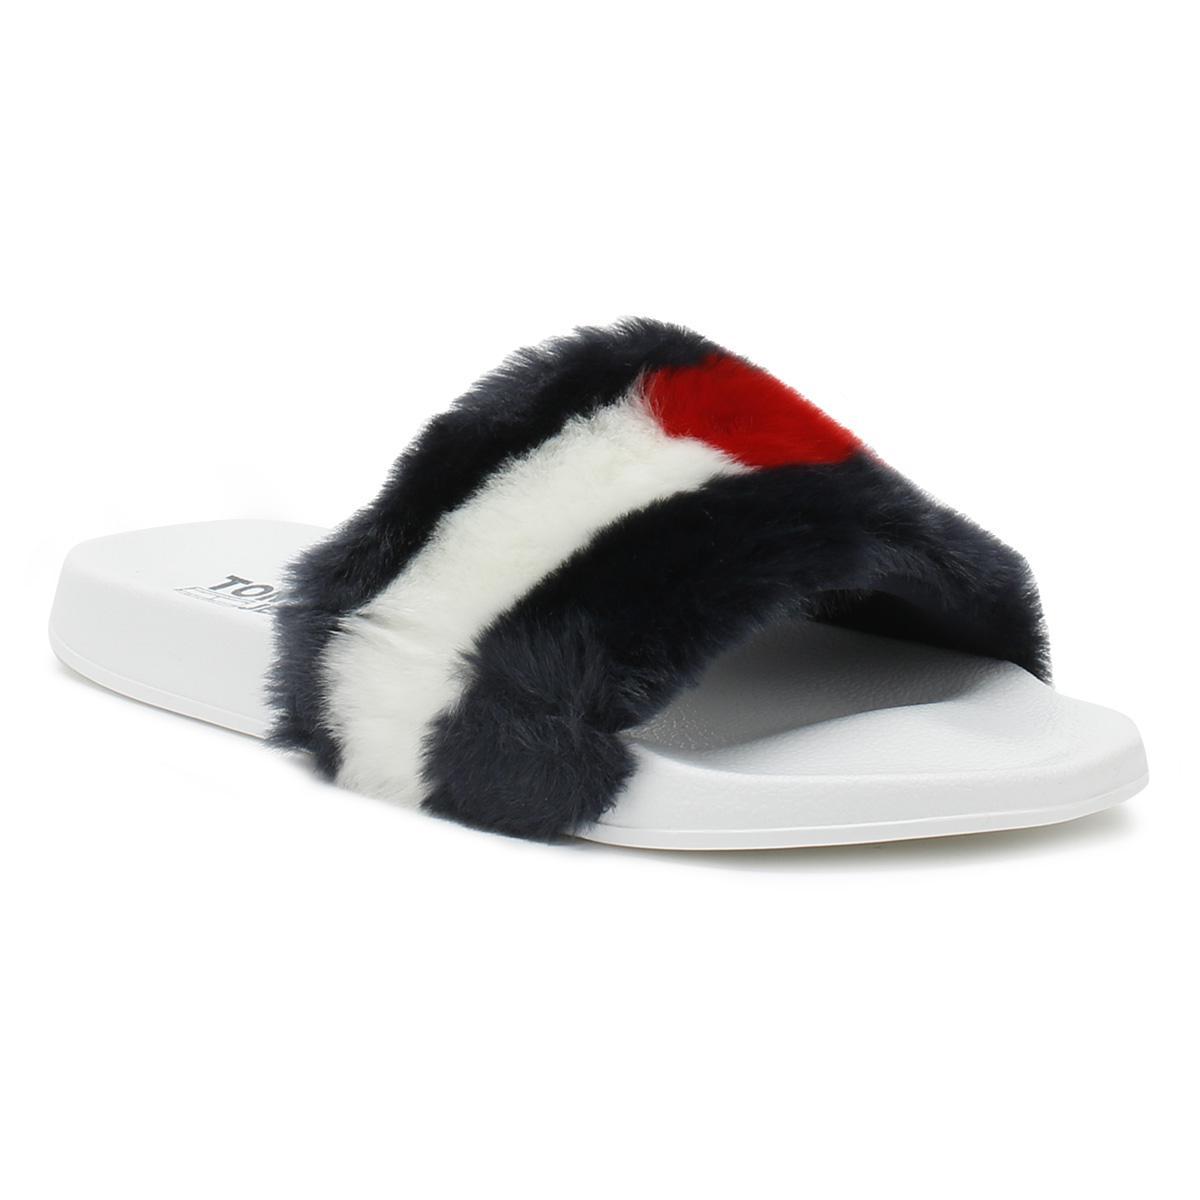 3ef9686e69cd Tommy Hilfiger Womens Rwb Funny Fur Pool Slides - Lyst